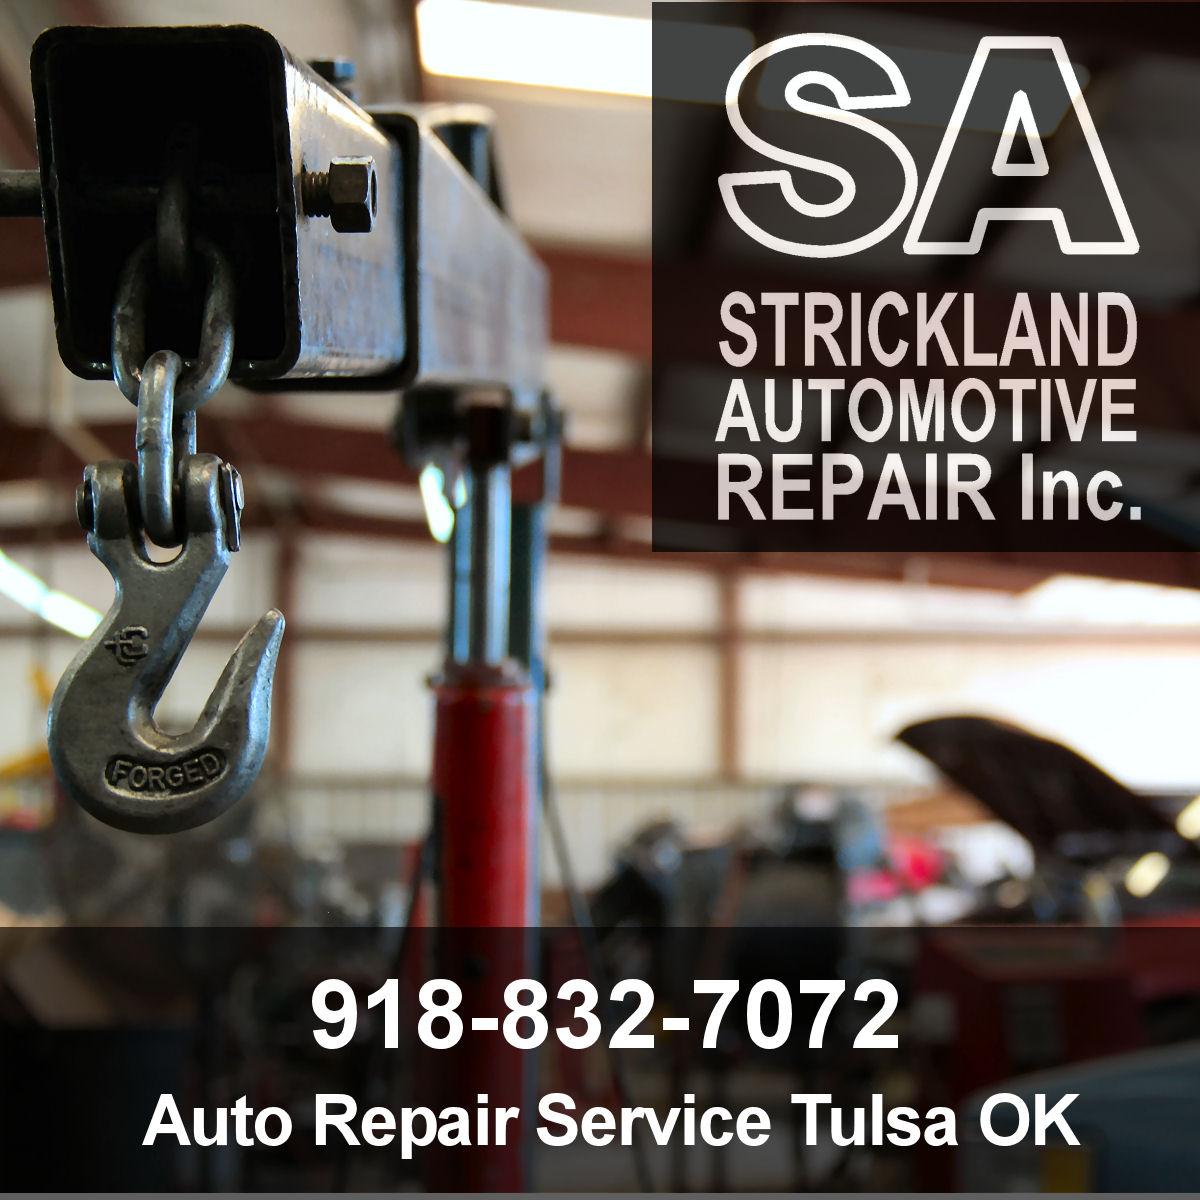 Auto Repair Services - Strickland Automotive Inc.